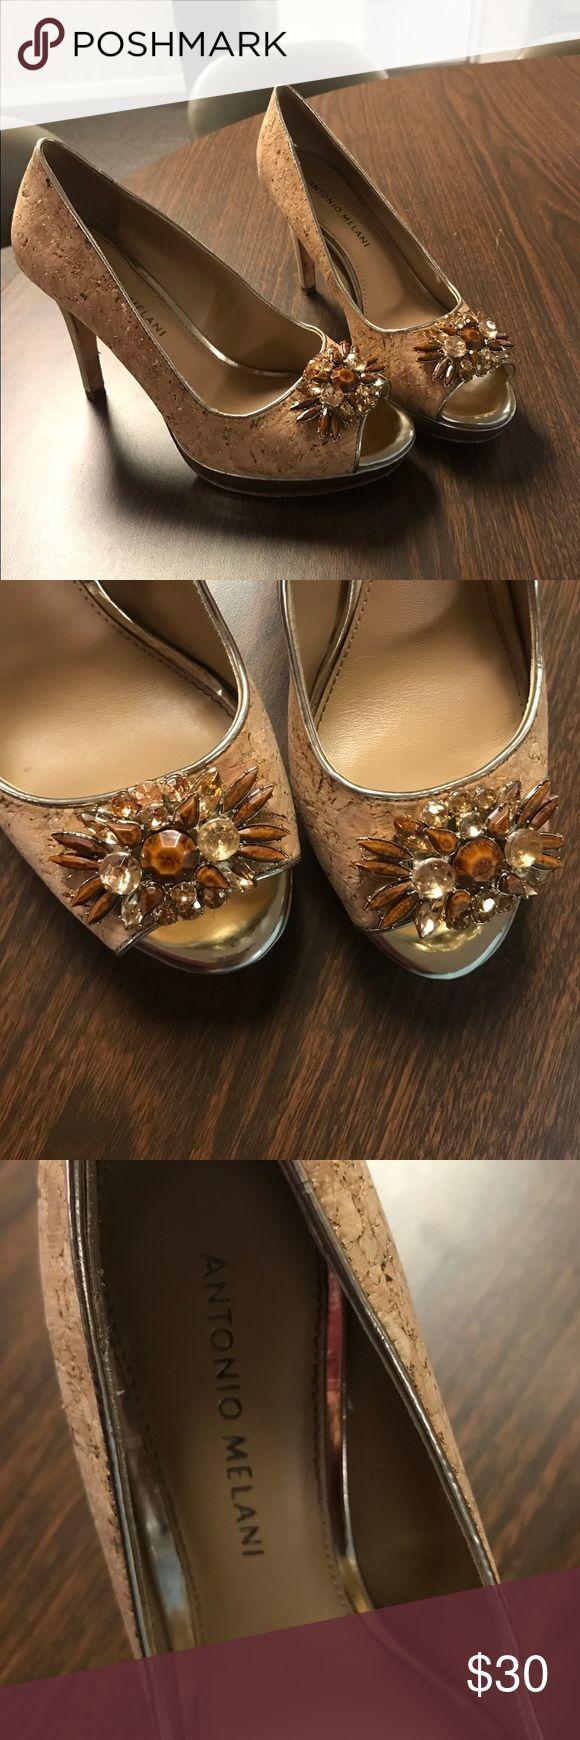 Antonio Melani cork jewel heels In good condition has no scratches besides a few on the heel as seen in pictures ANTONIO MELANI Shoes Heels